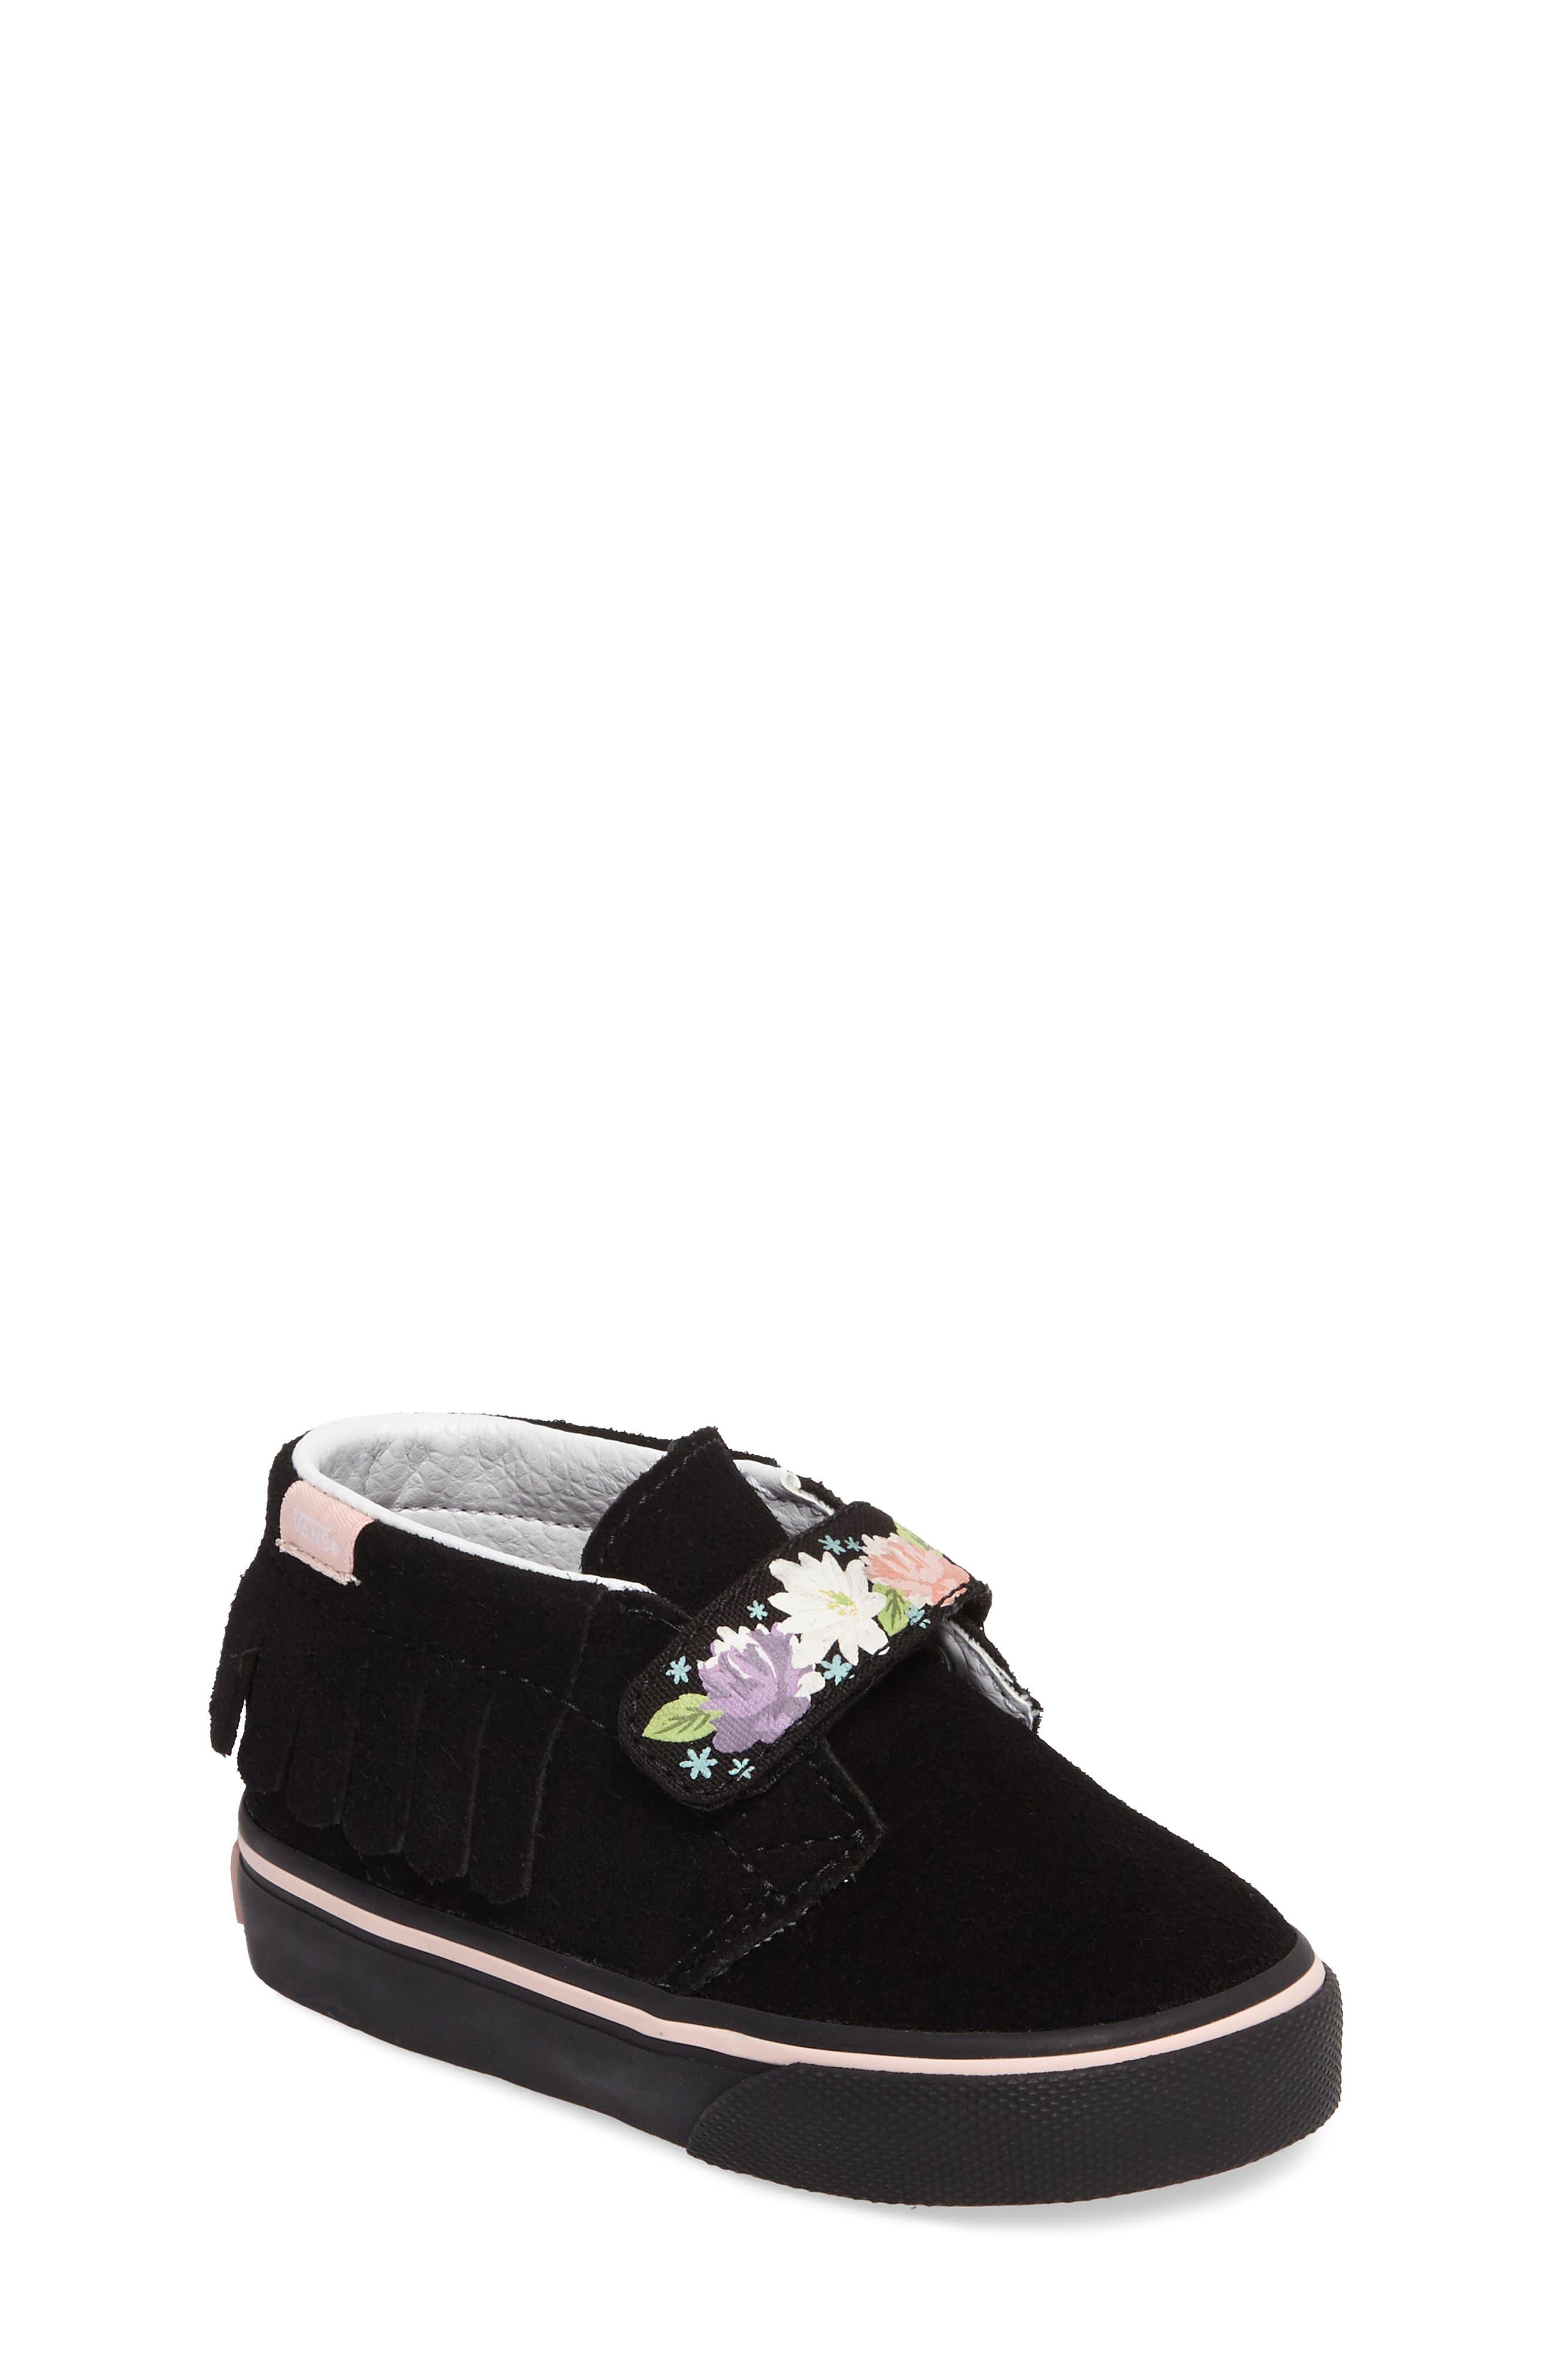 Chukka V Moc Sneaker,                         Main,                         color, 001